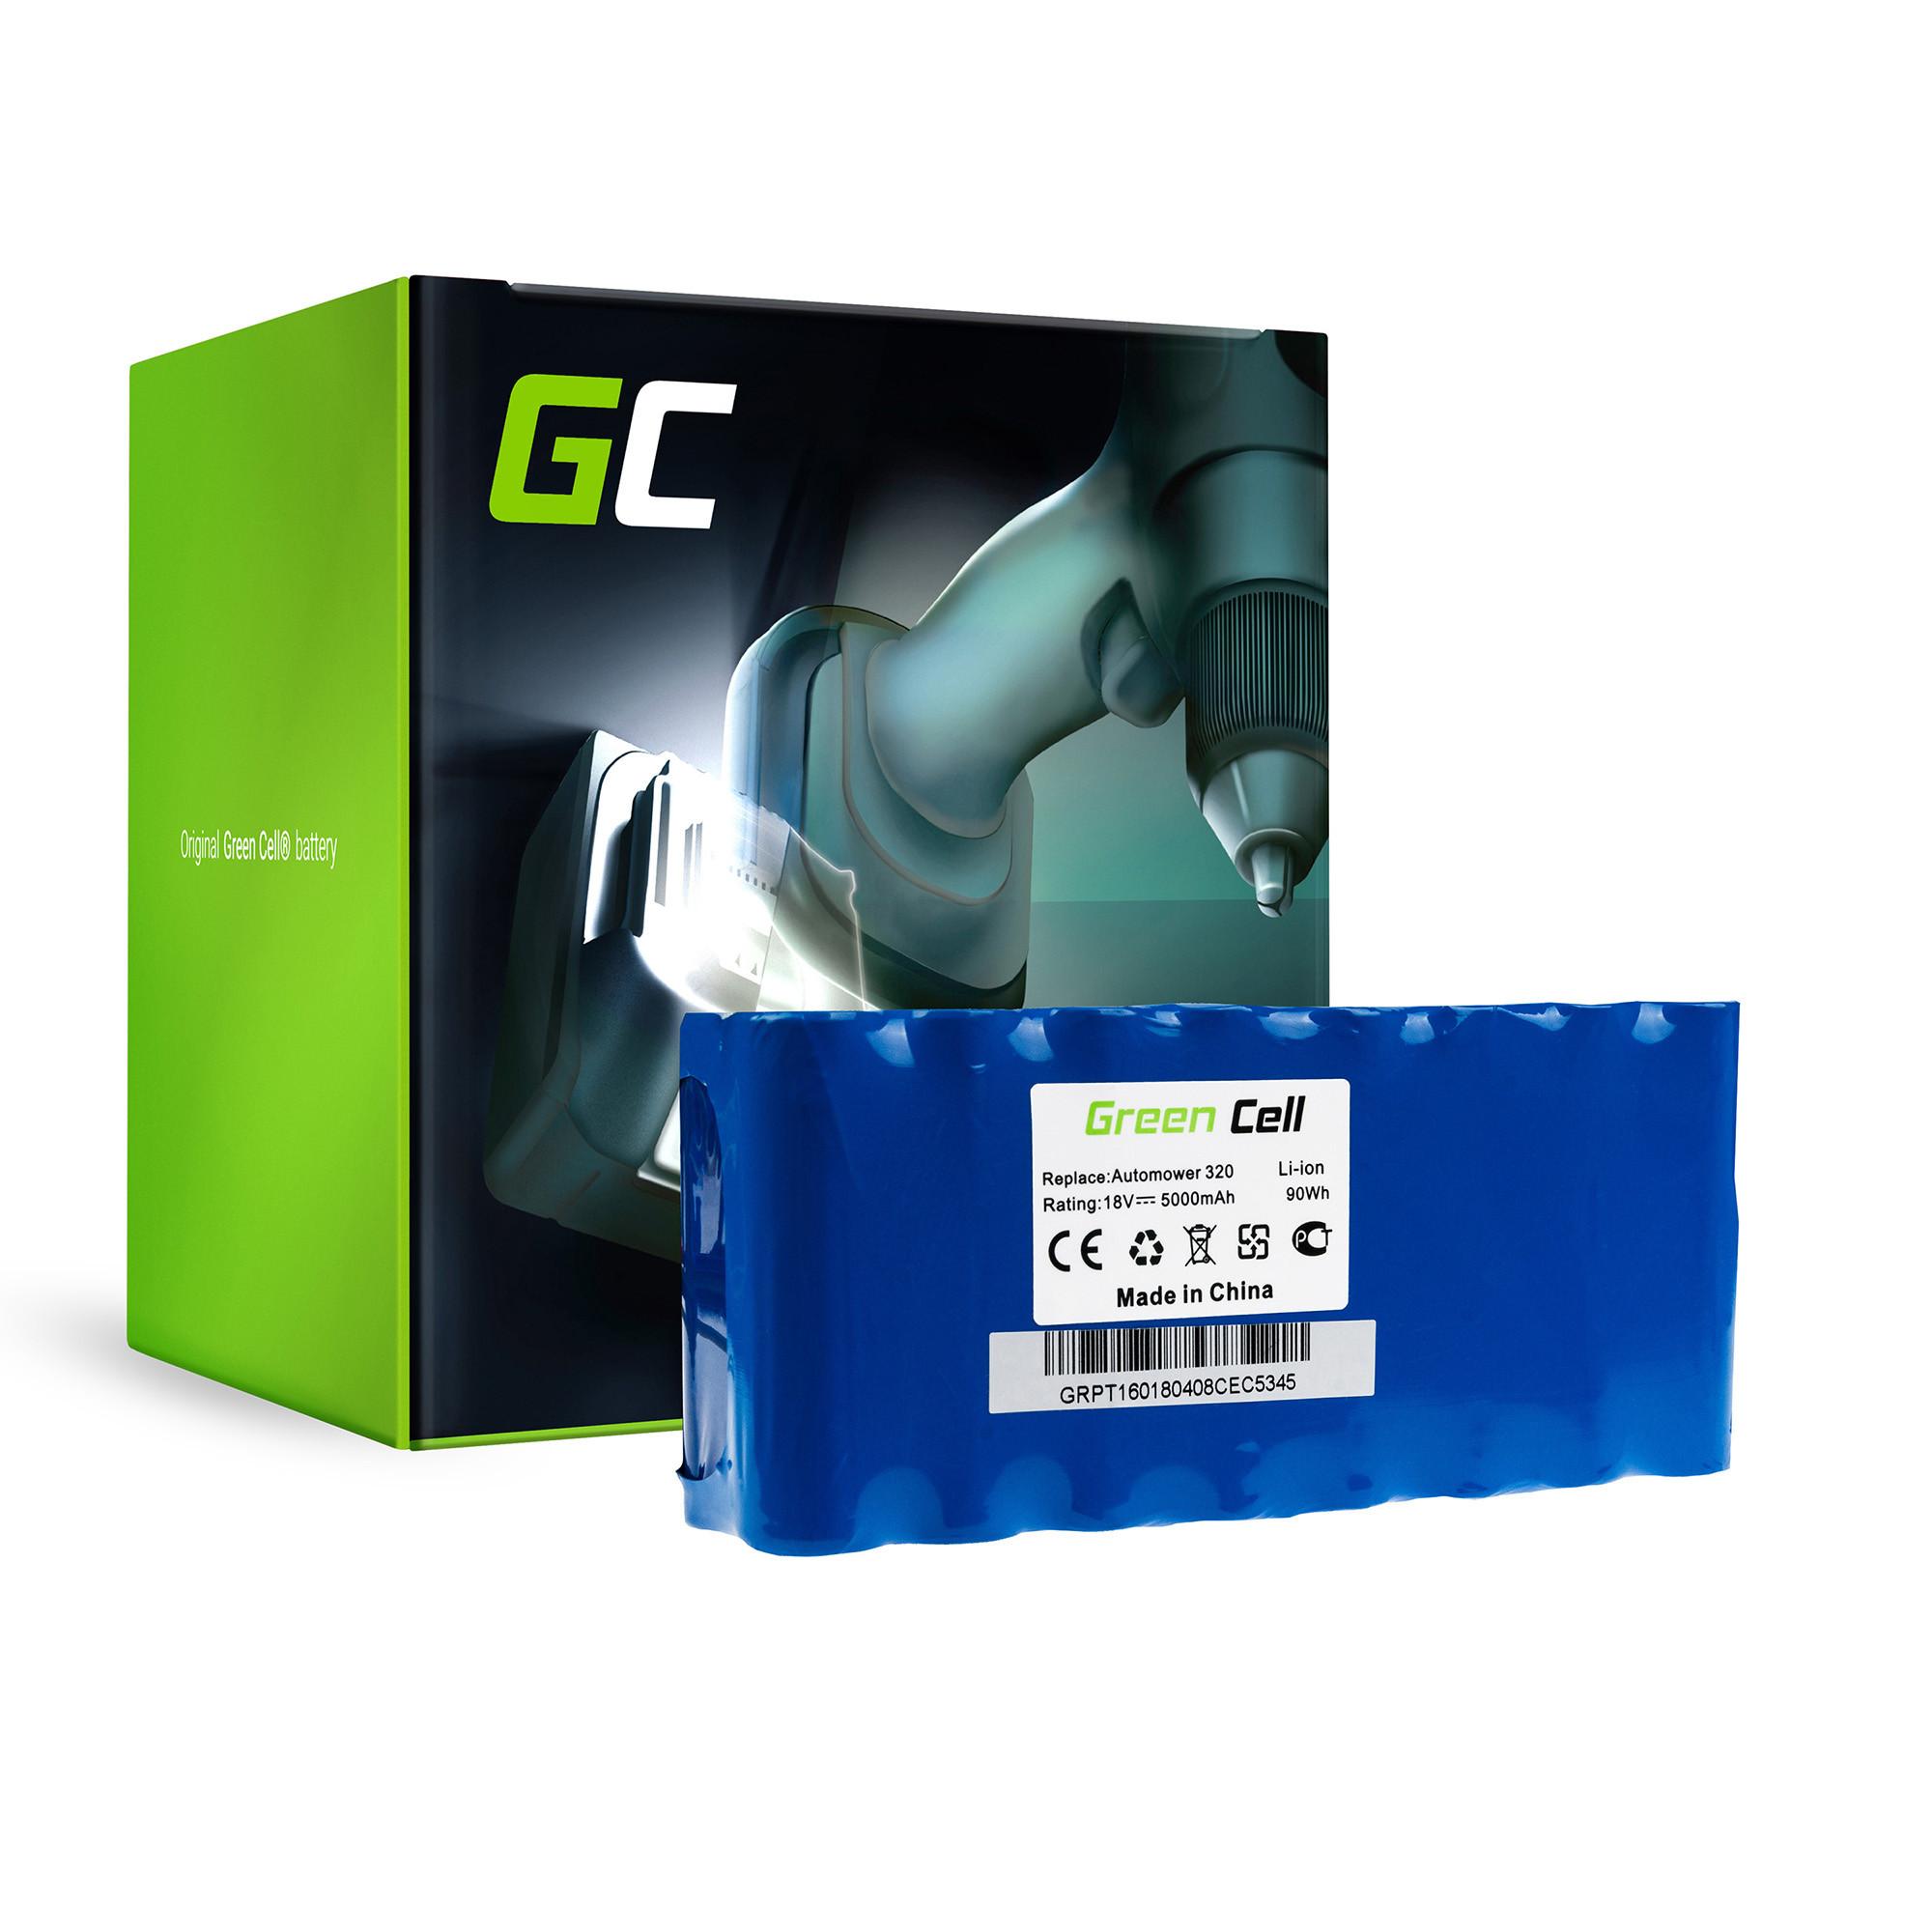 Baterie Green Cell Husqvarna Automower 320   Husqvarna Automower 330X  H usqvarna Automower 430 18V 5000mAh Li-ion - neoriginální